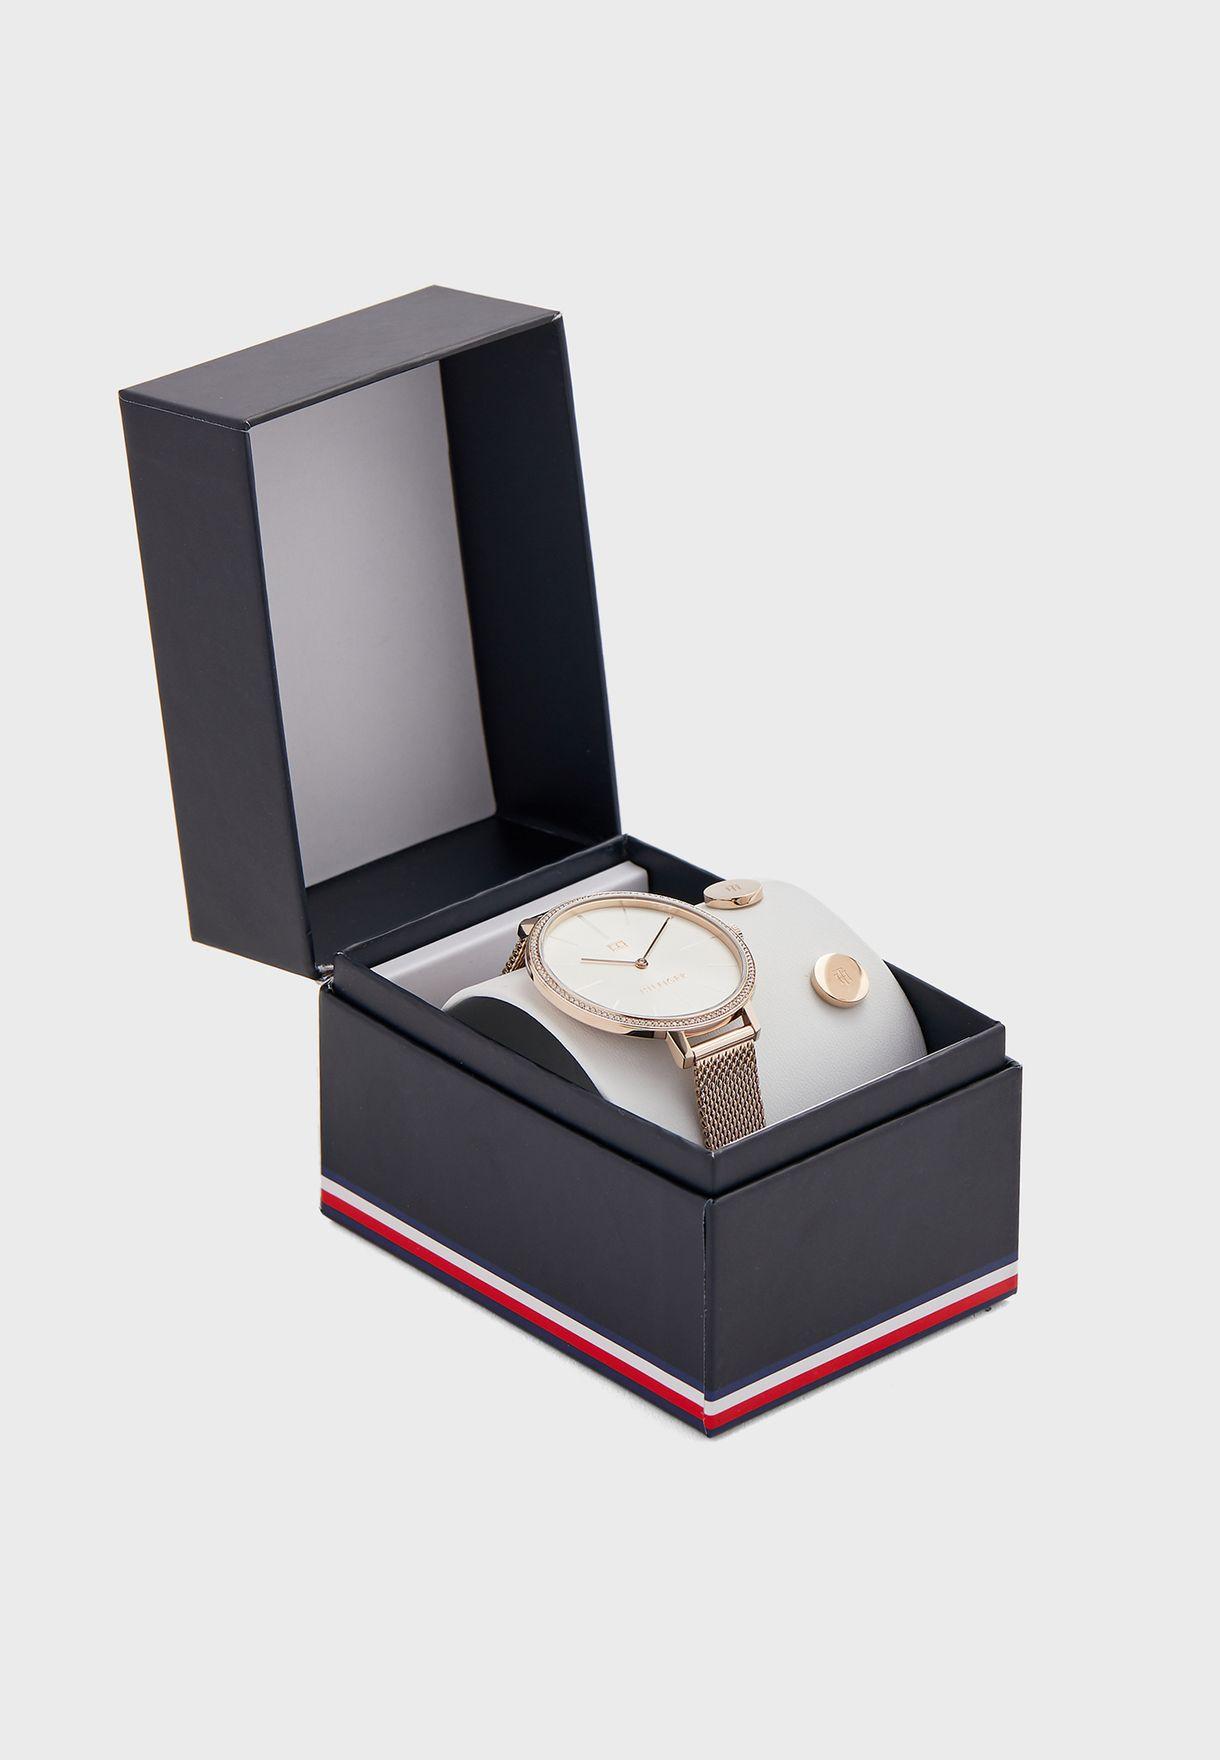 Kelly Analog Watch+Earrings Gift Set